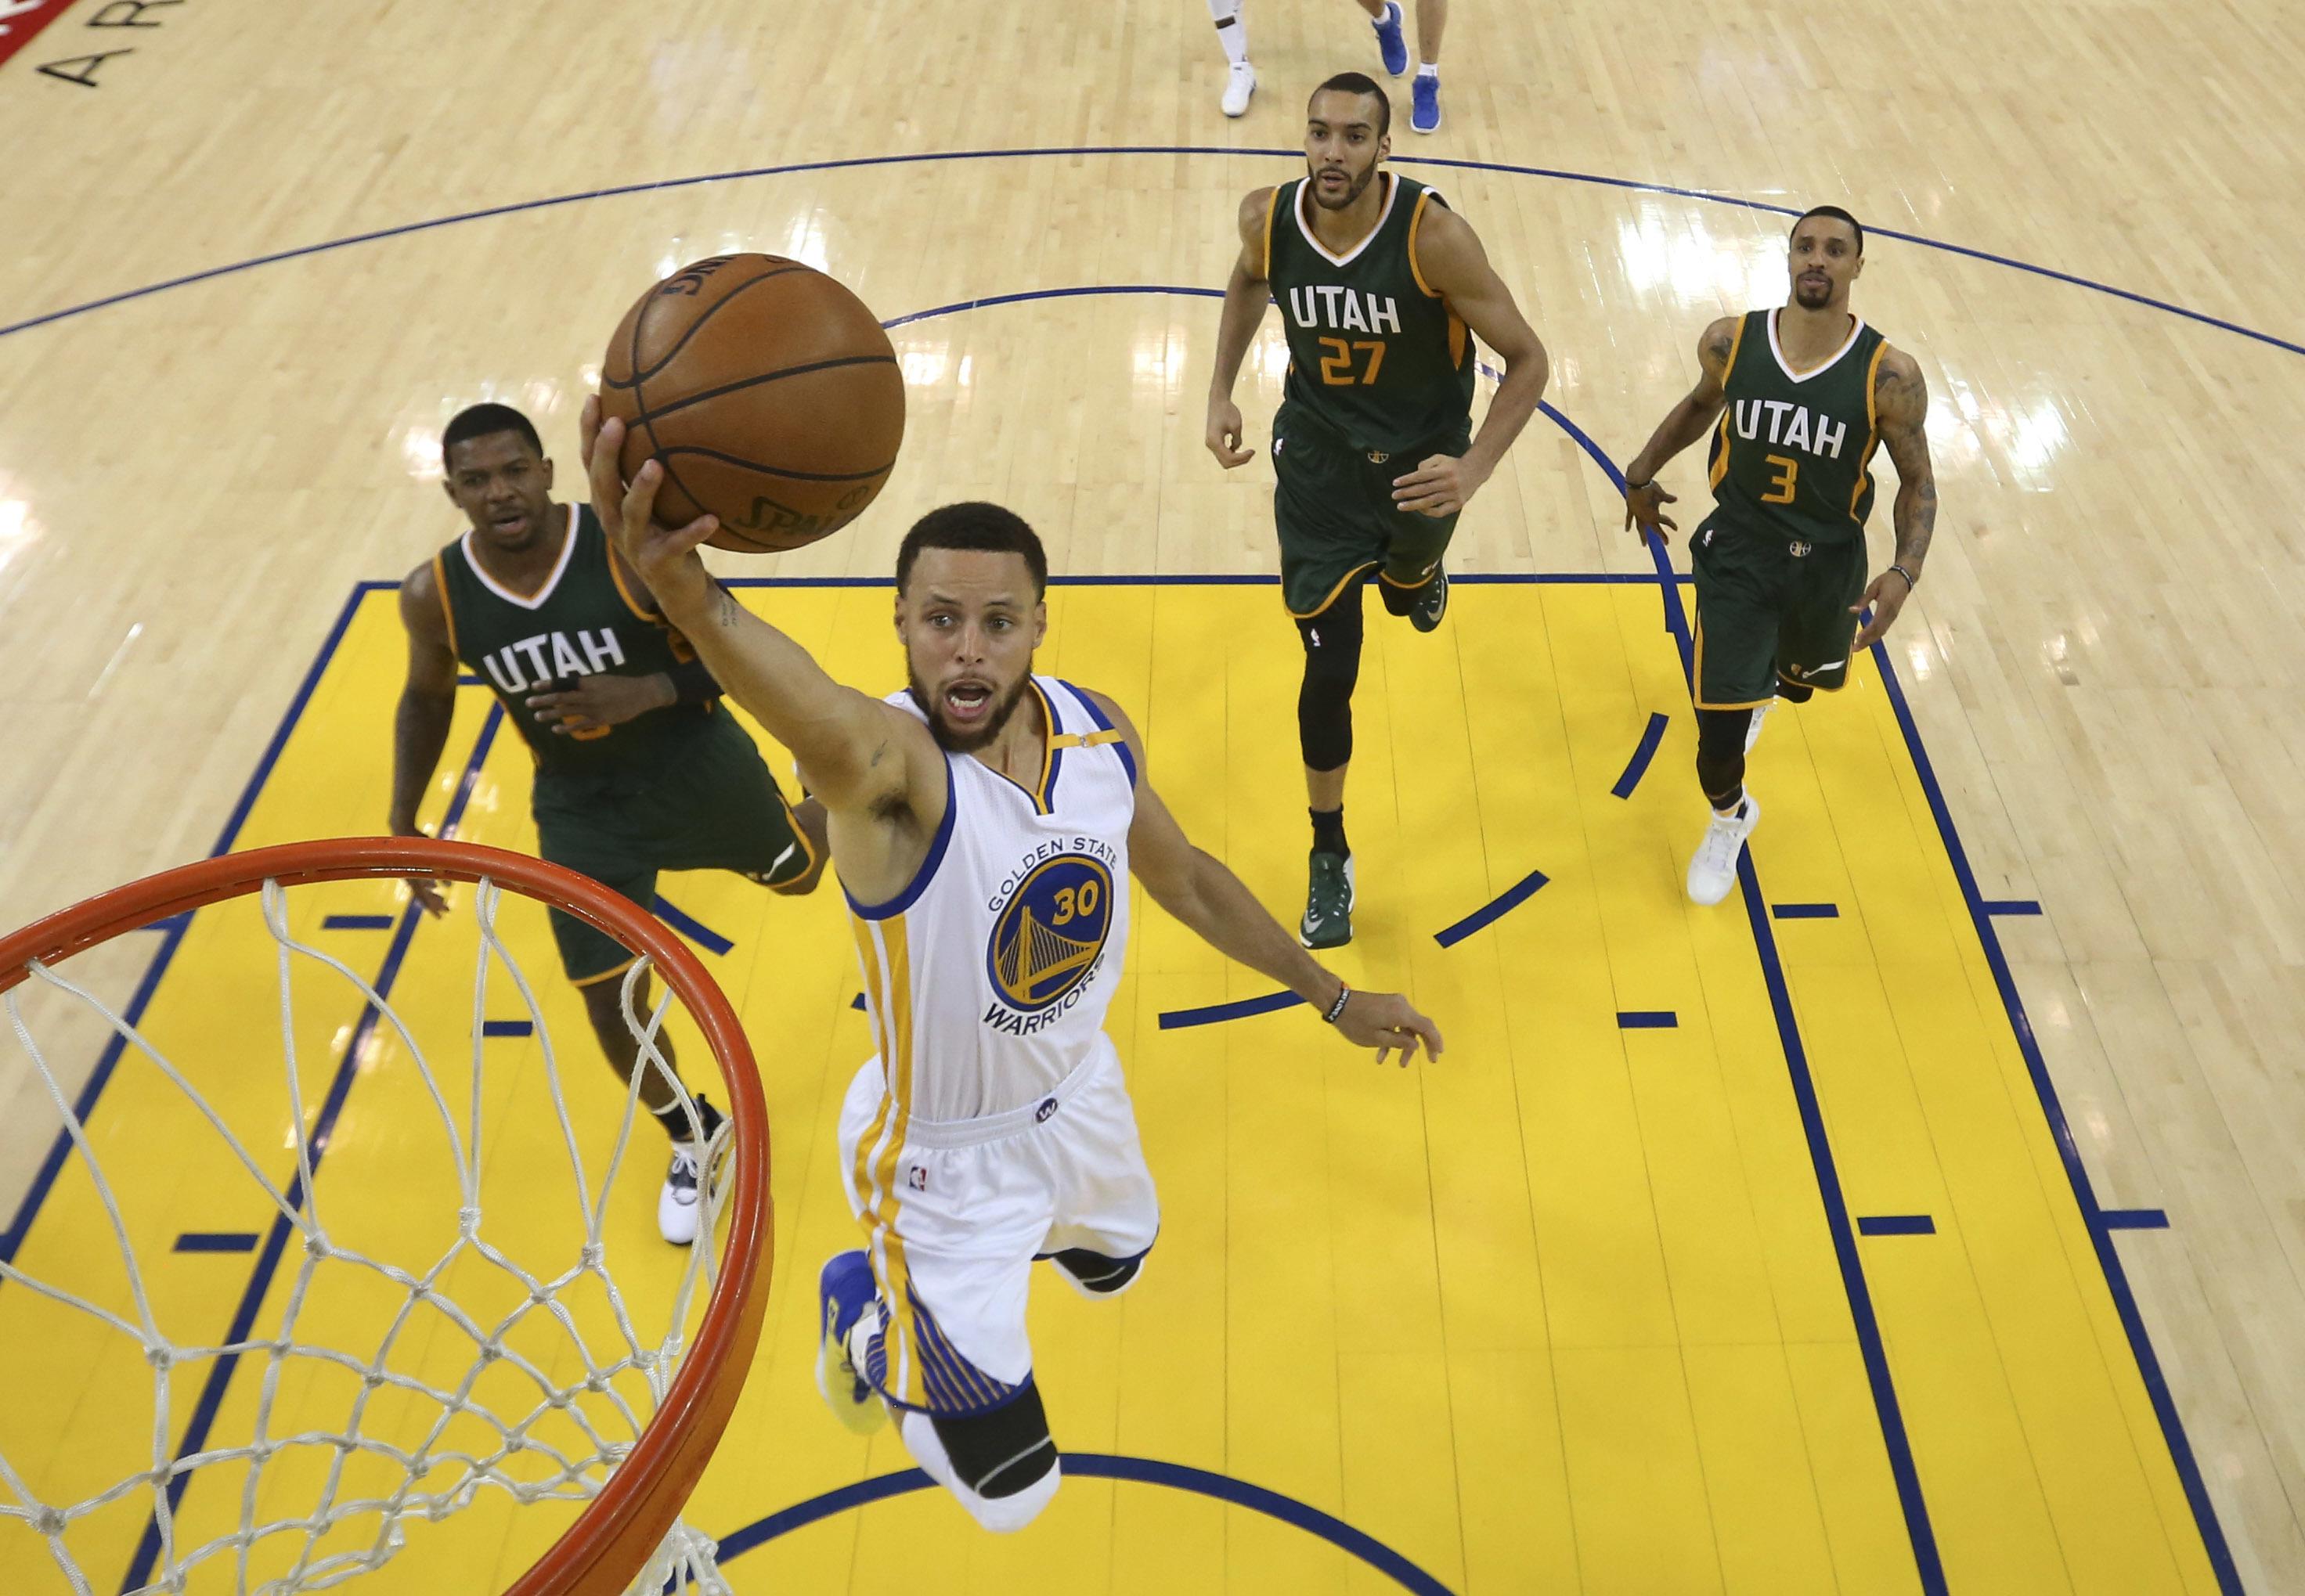 Stephen Curry(30號)以22分7籃板5助攻成績,帶領勇士擊敗爵士。(達志影像)